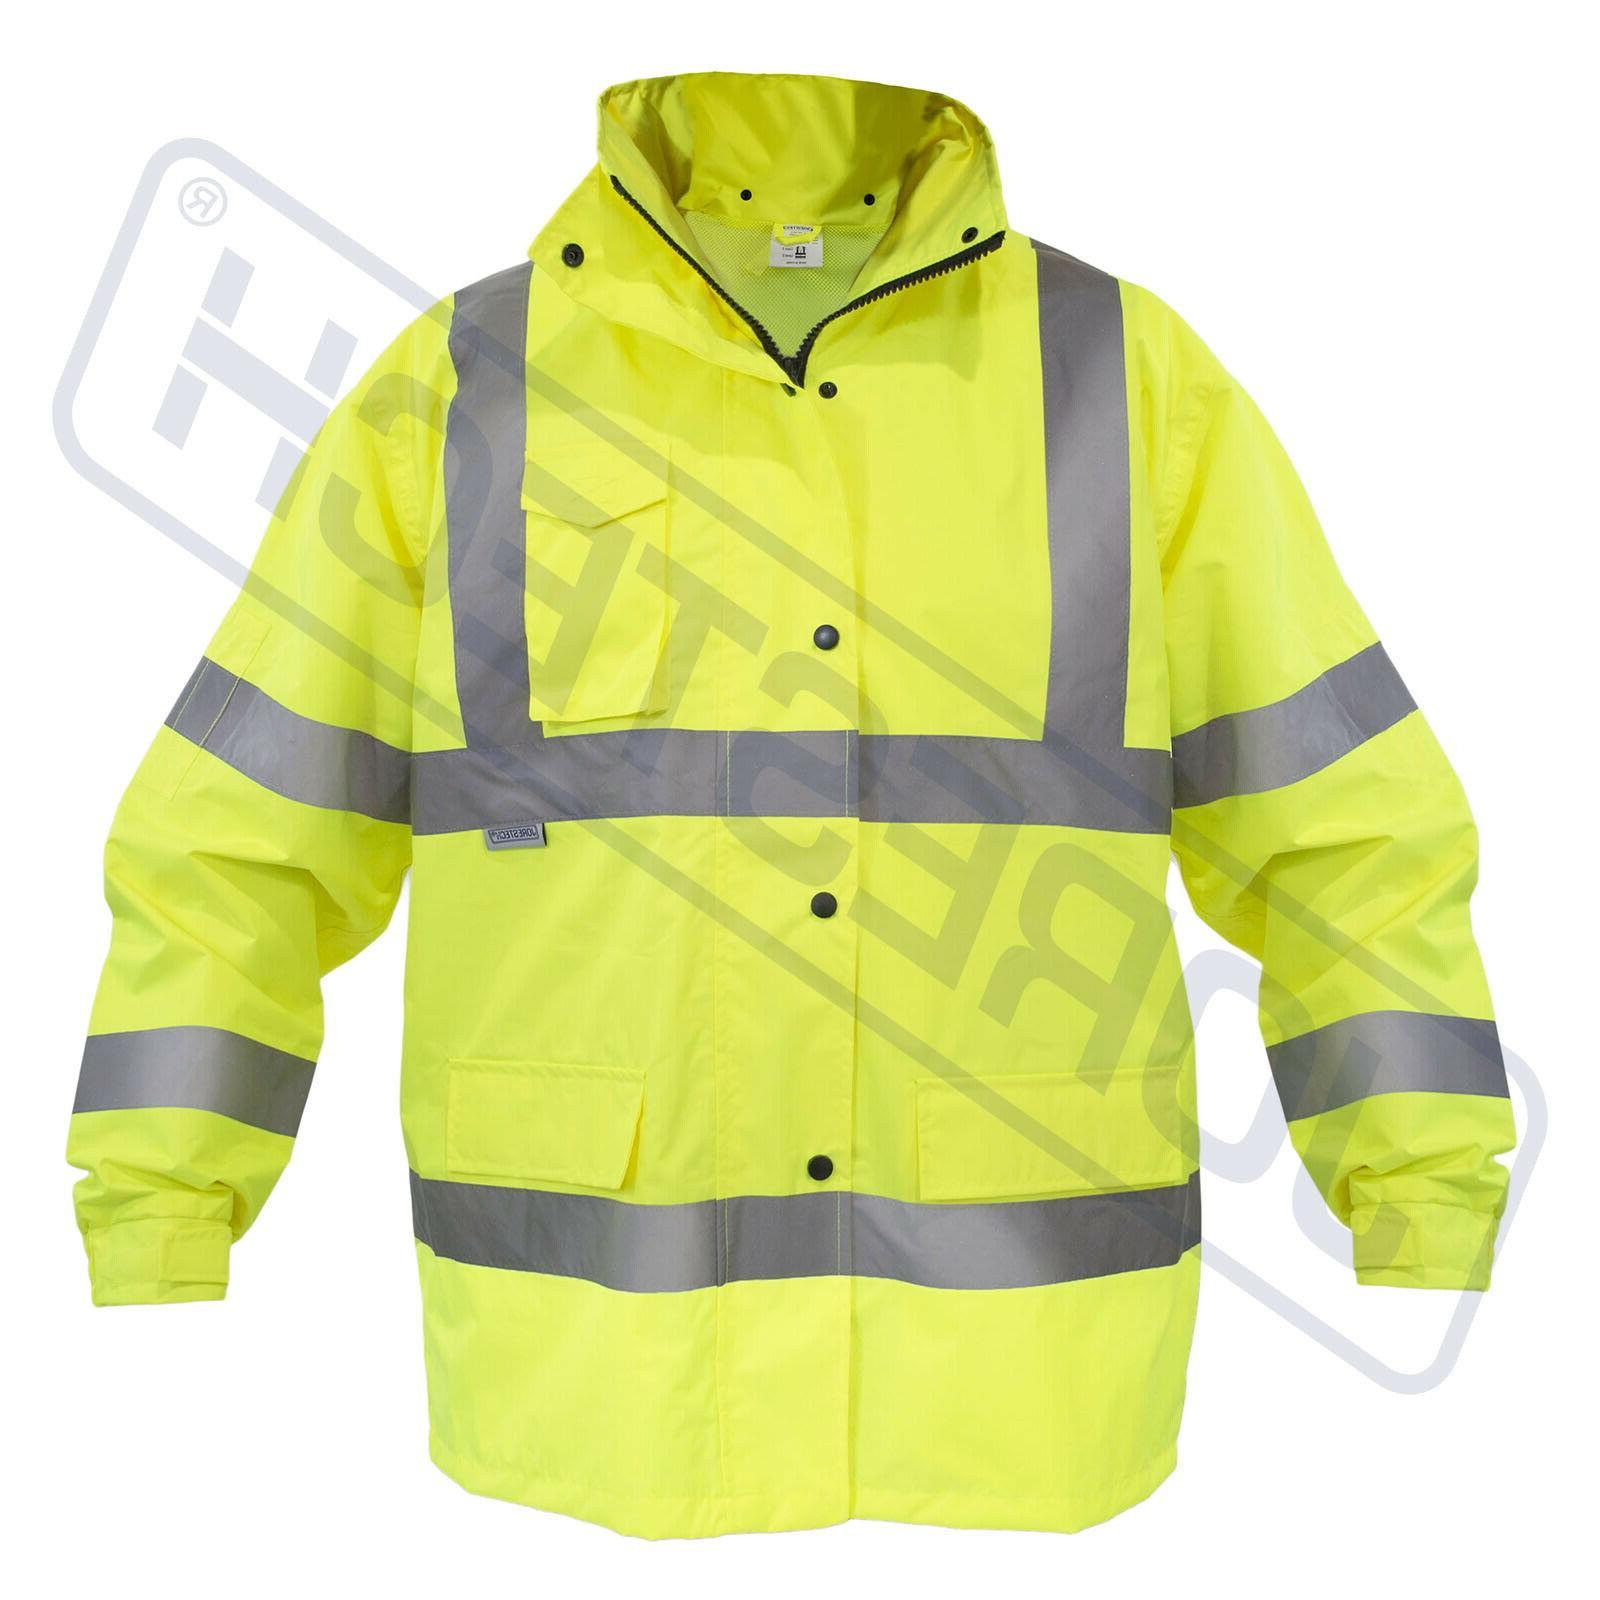 Safety Jacket Reflective Green w